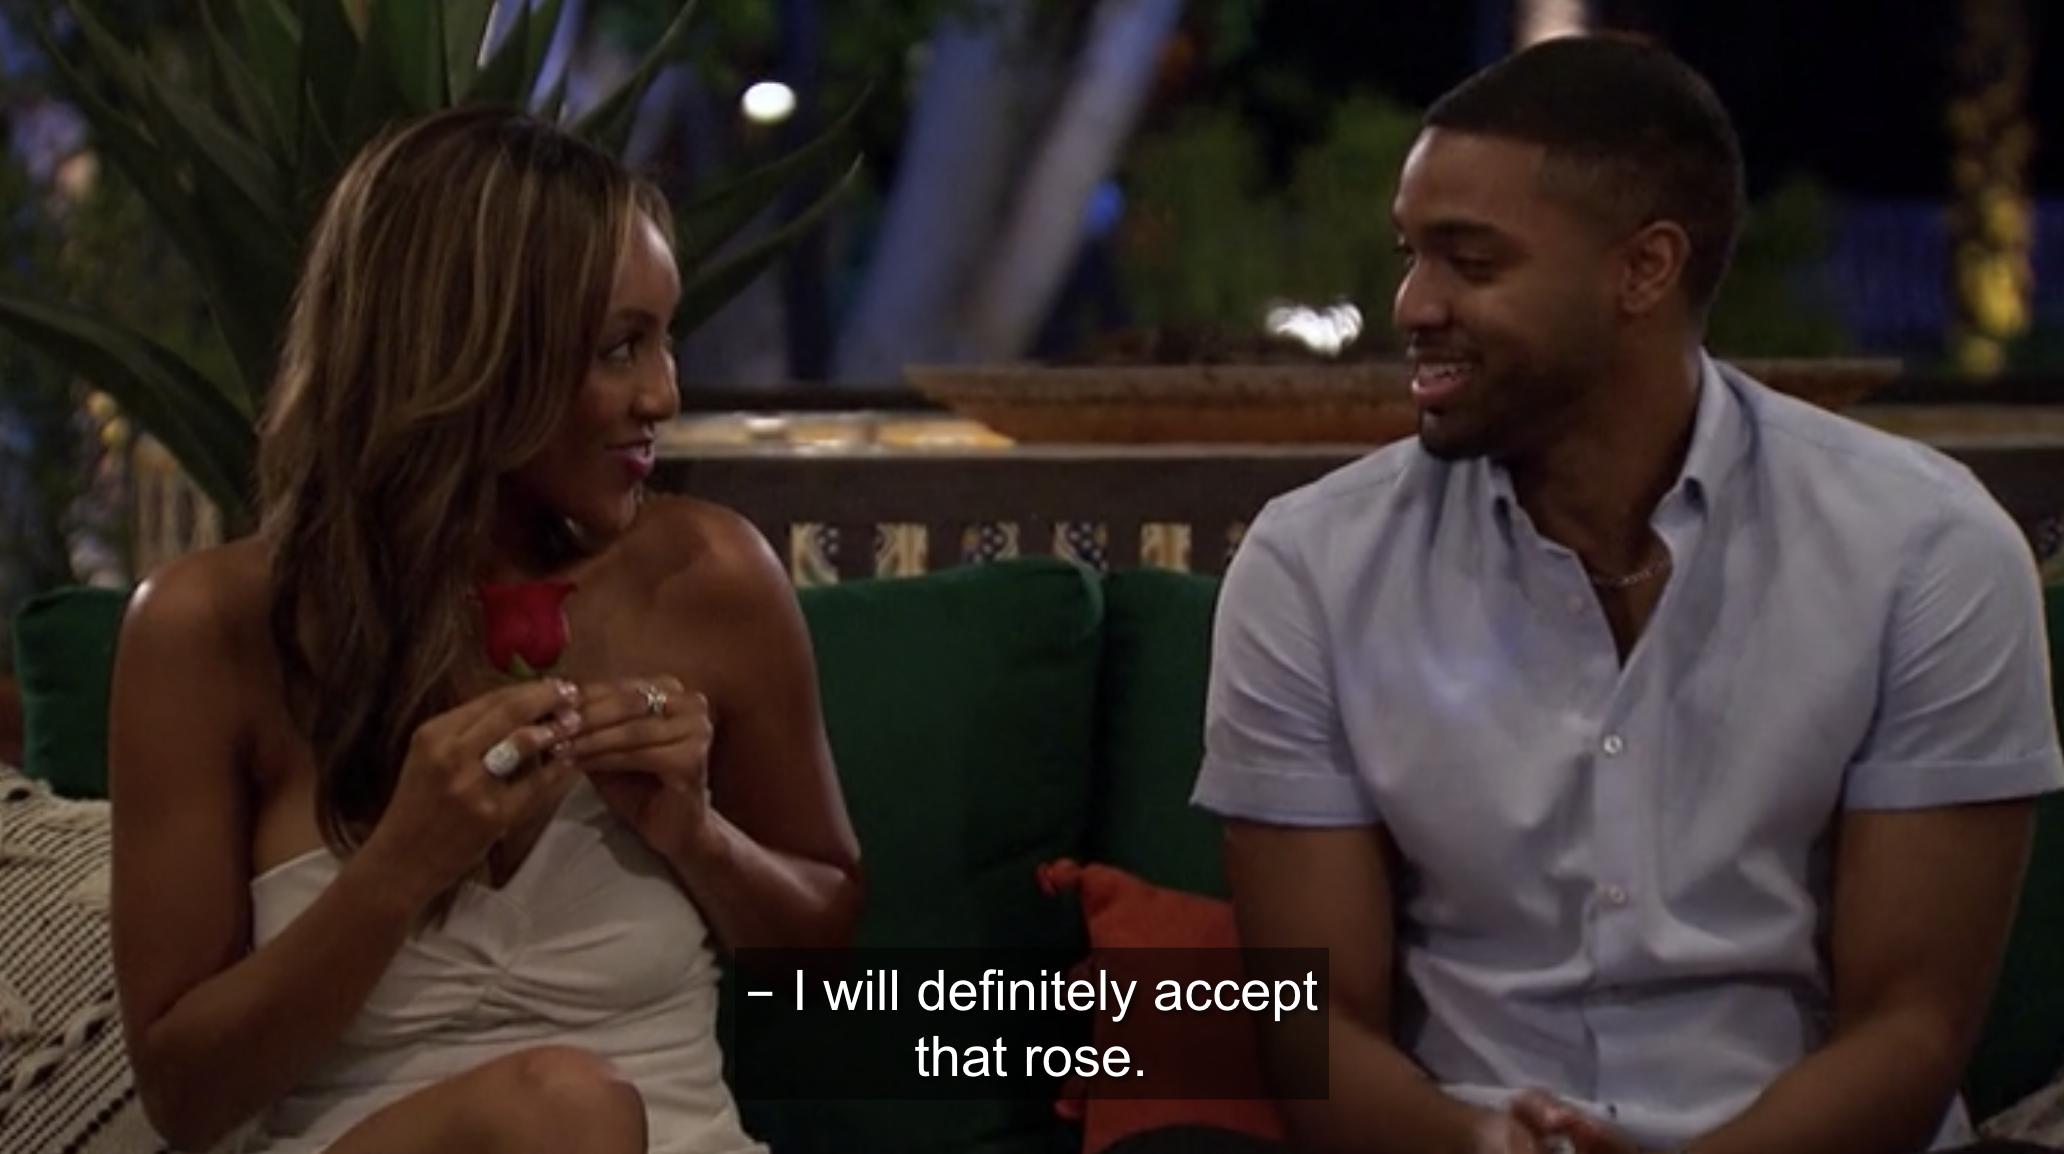 Ivan tells Taysia he'll accept the rose